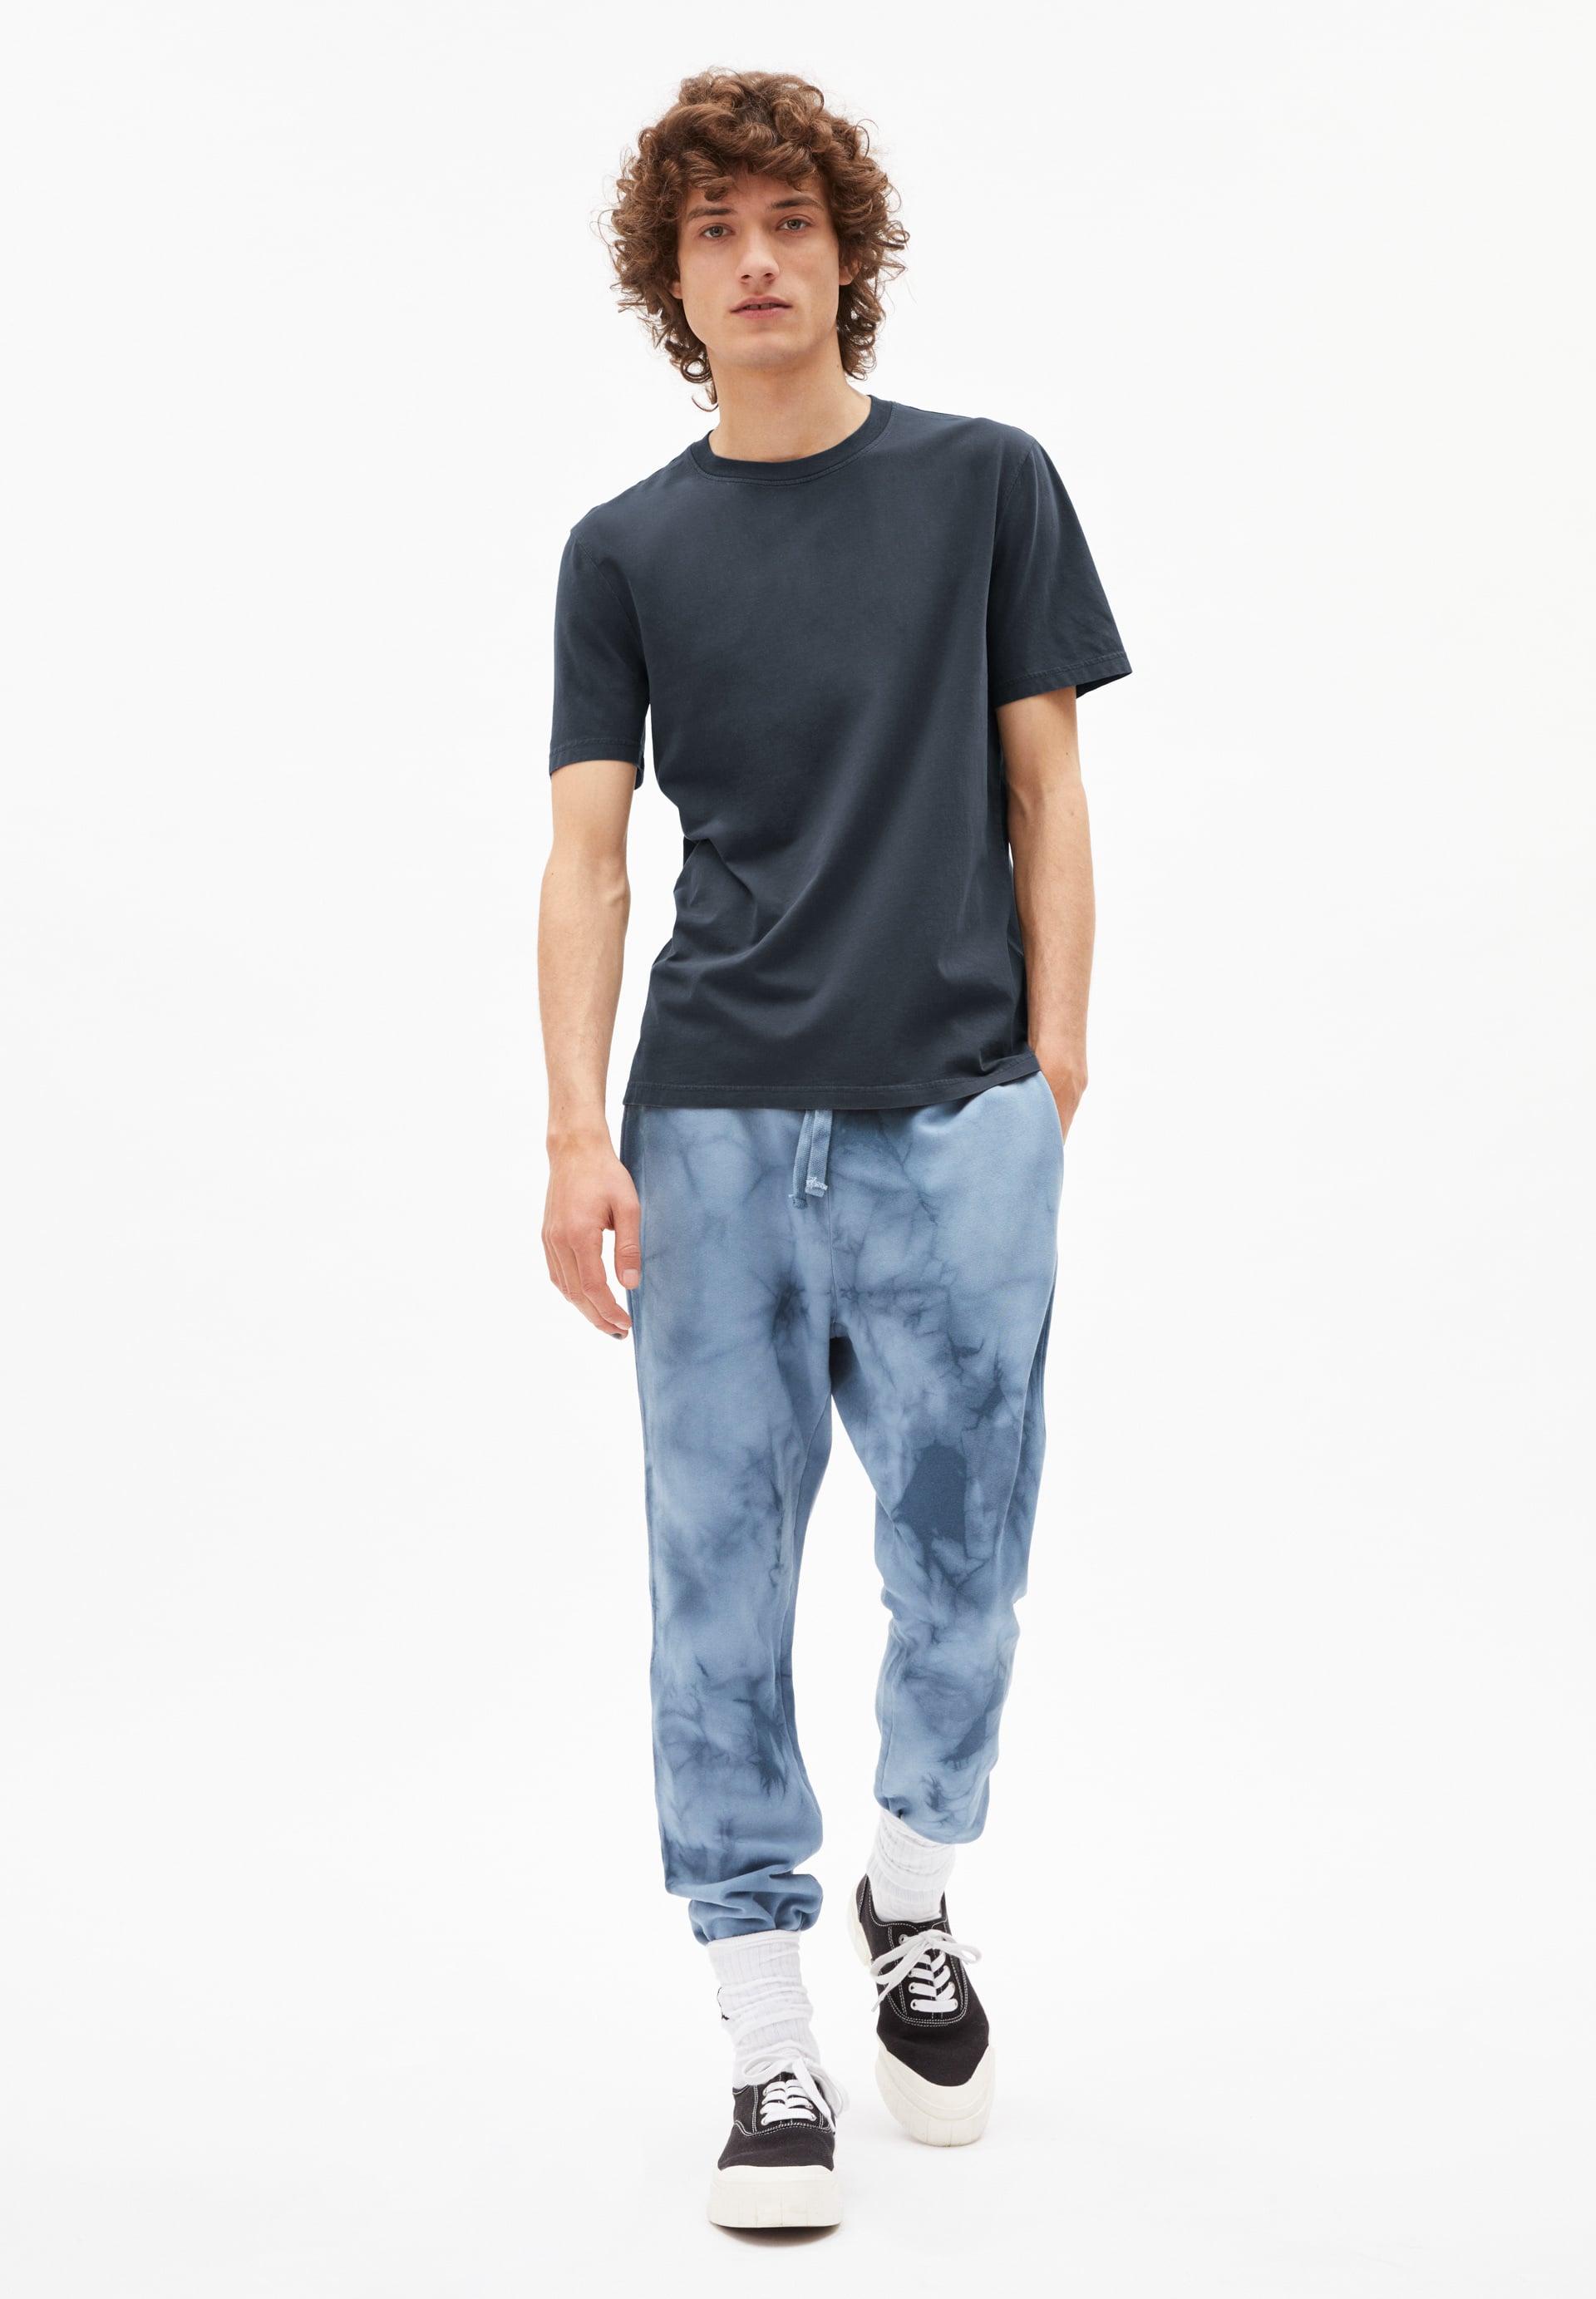 AADO EARTHCOLORS® T-Shirt aus Bio-Baumwolle